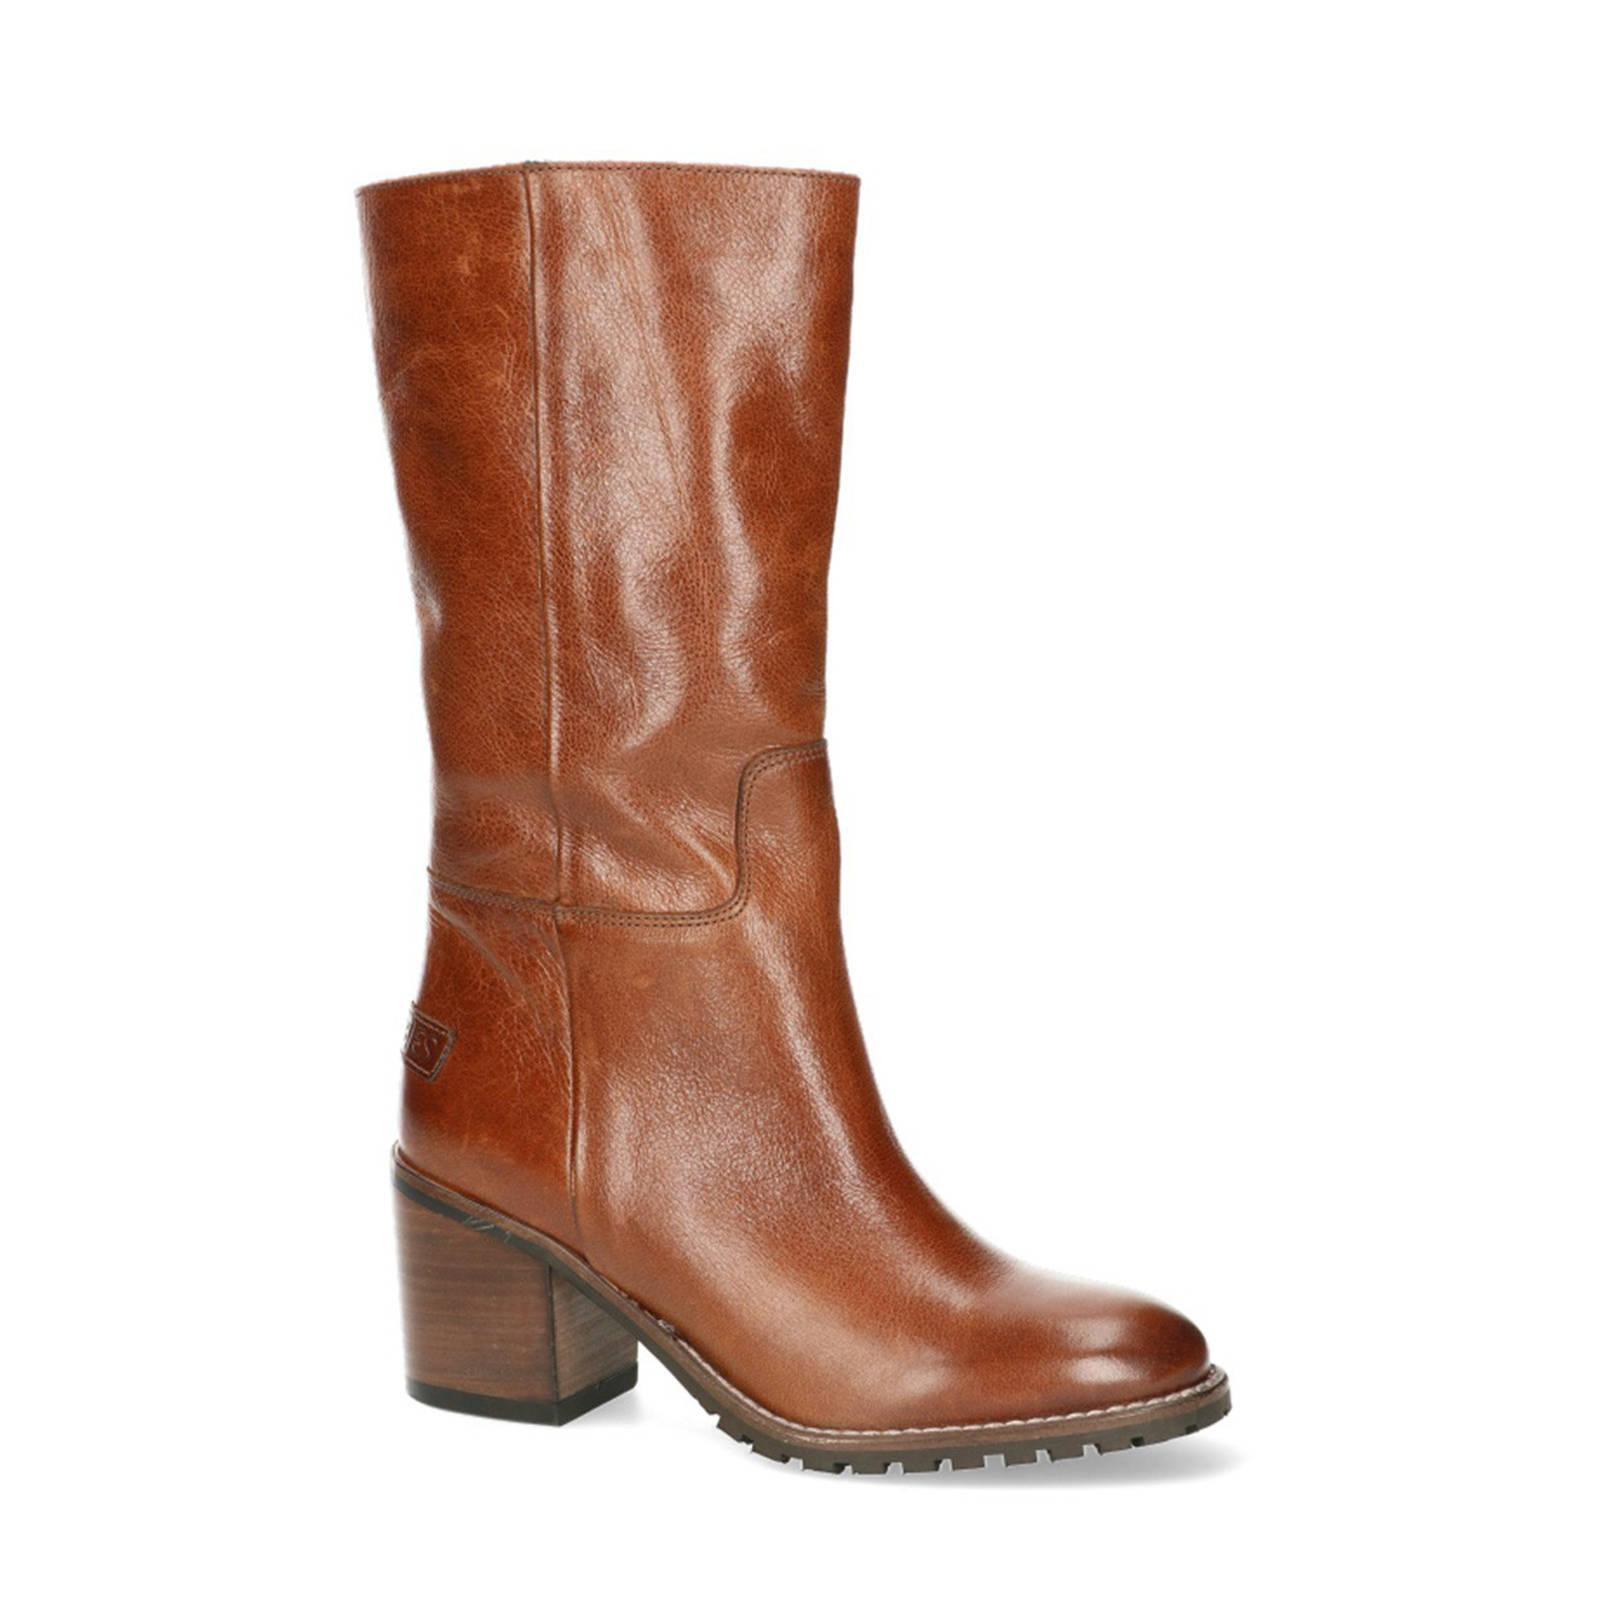 Laarzen Sale | Tot 50% korting op laarzen |Shabbies Amsterdam